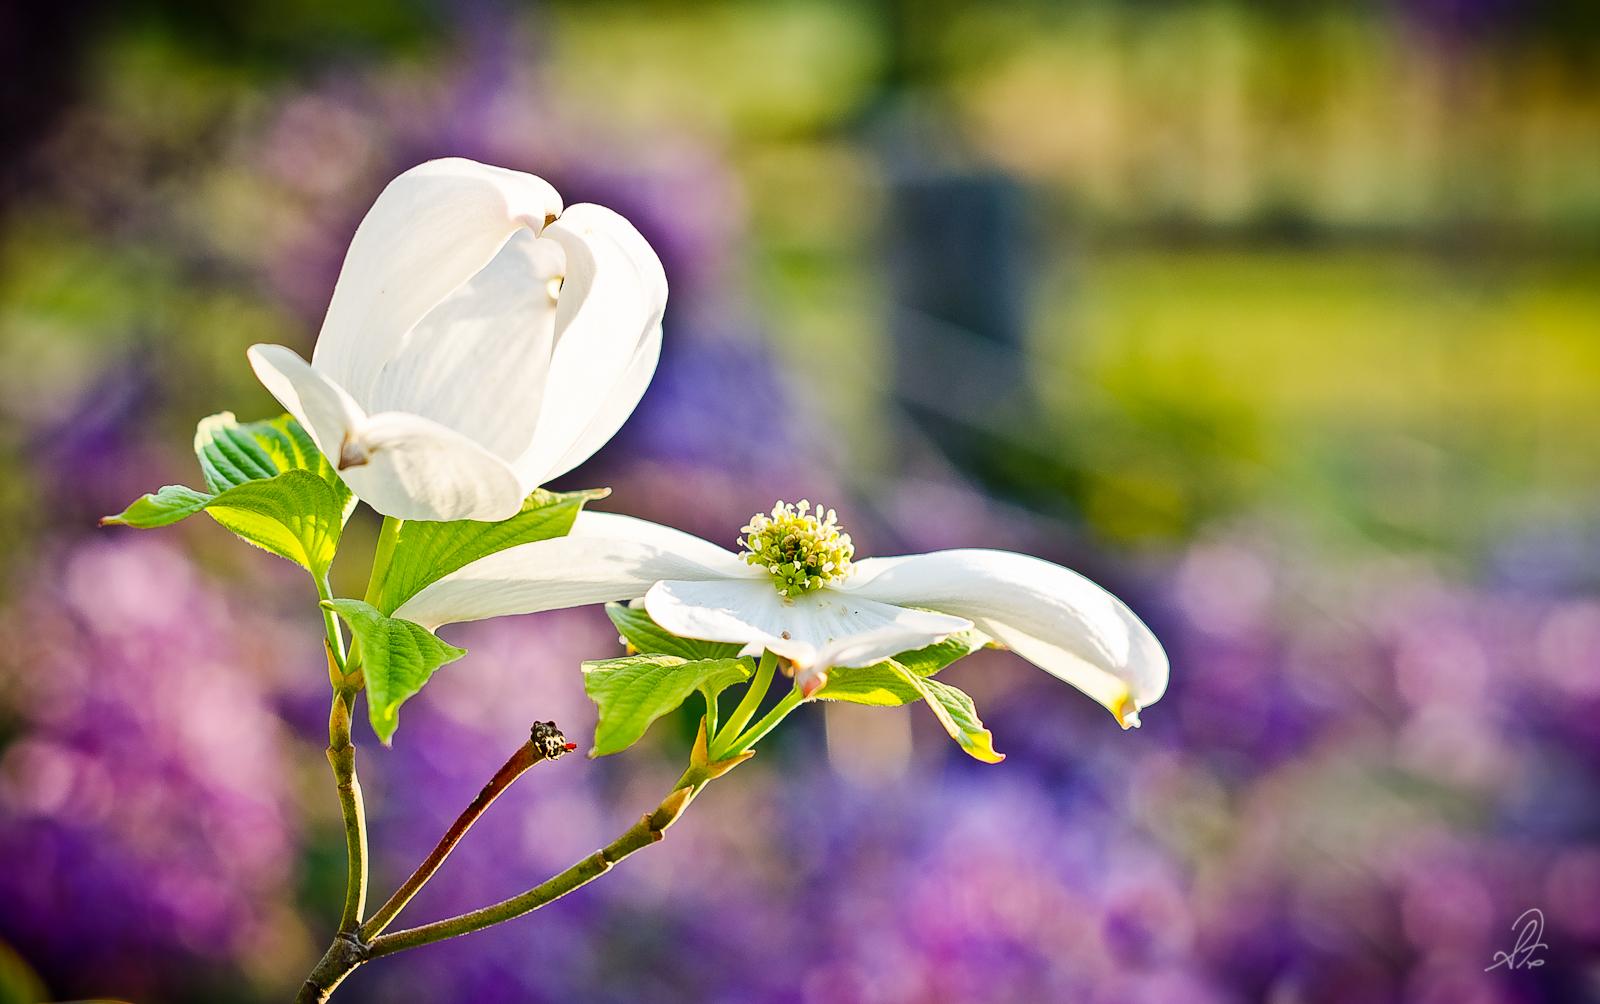 Dogwood Flower Bloom in Spring